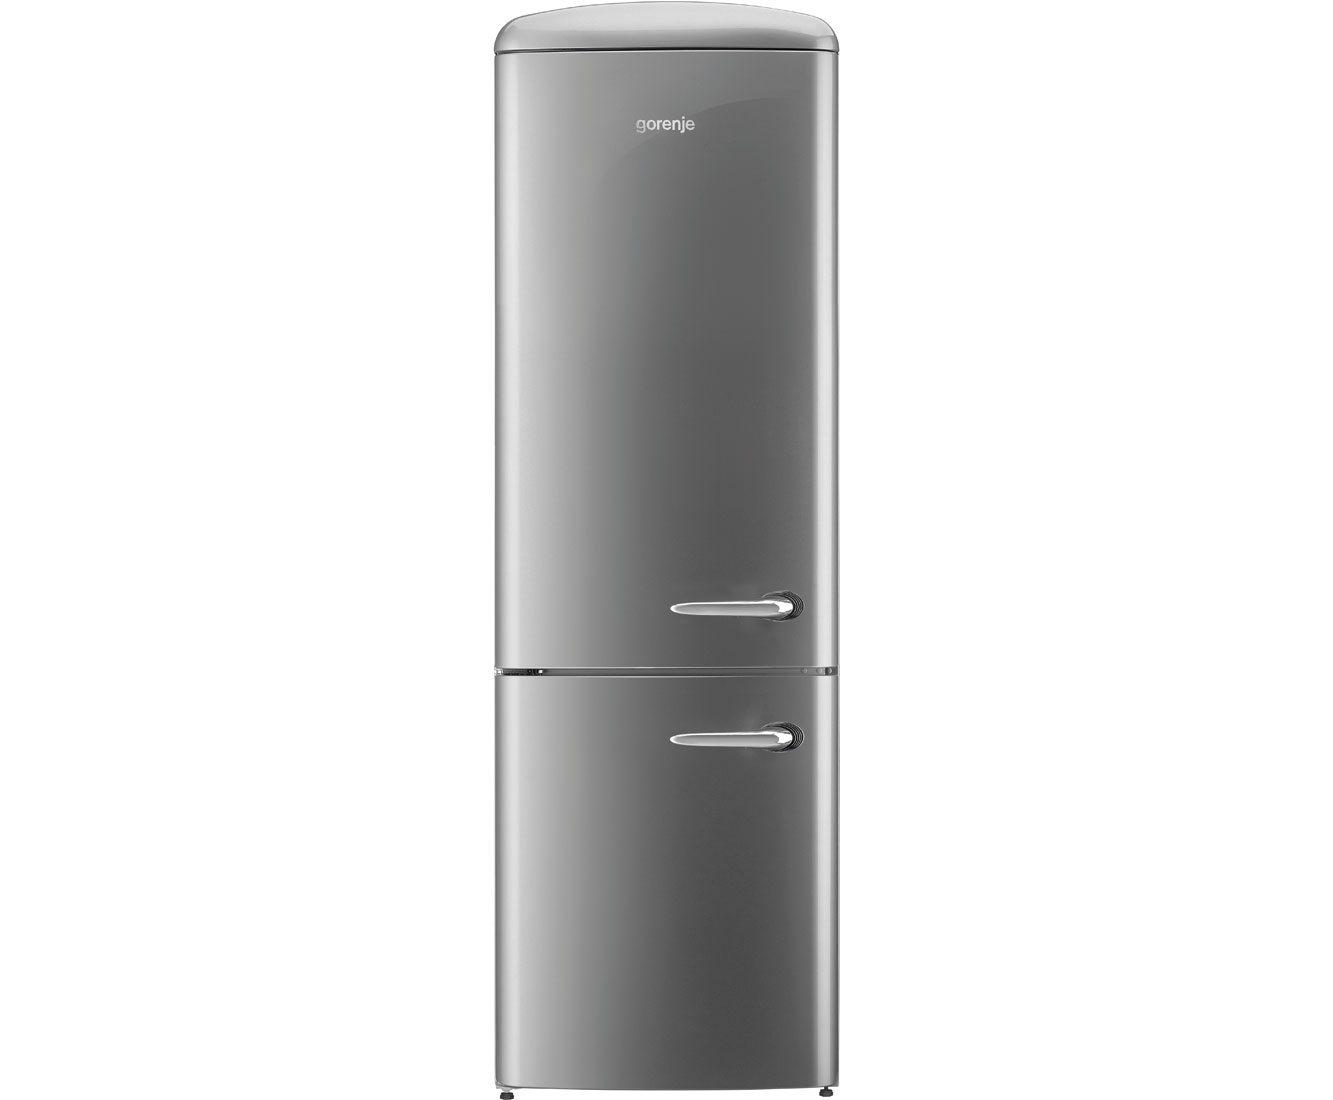 Kühlschrank Nostalgie Retro : Retro wave nostalgie kühlschrank magnet set teilig mag ebay